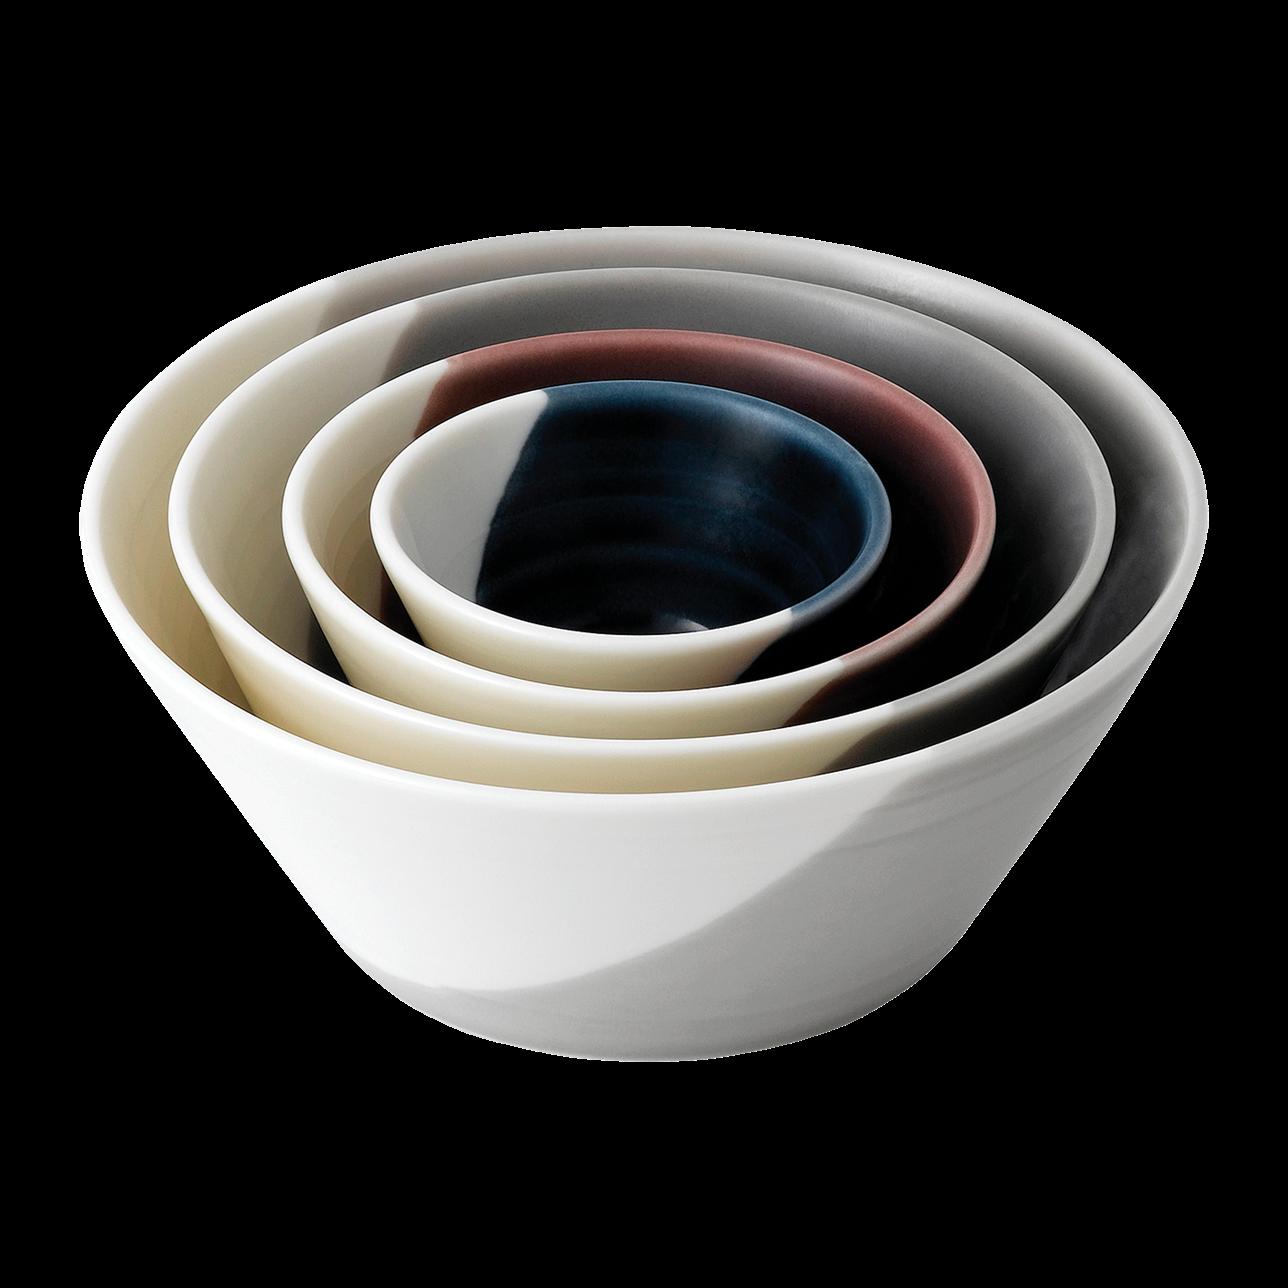 Bowls of Plenty Nesting Bowls - Small (Set of 4)